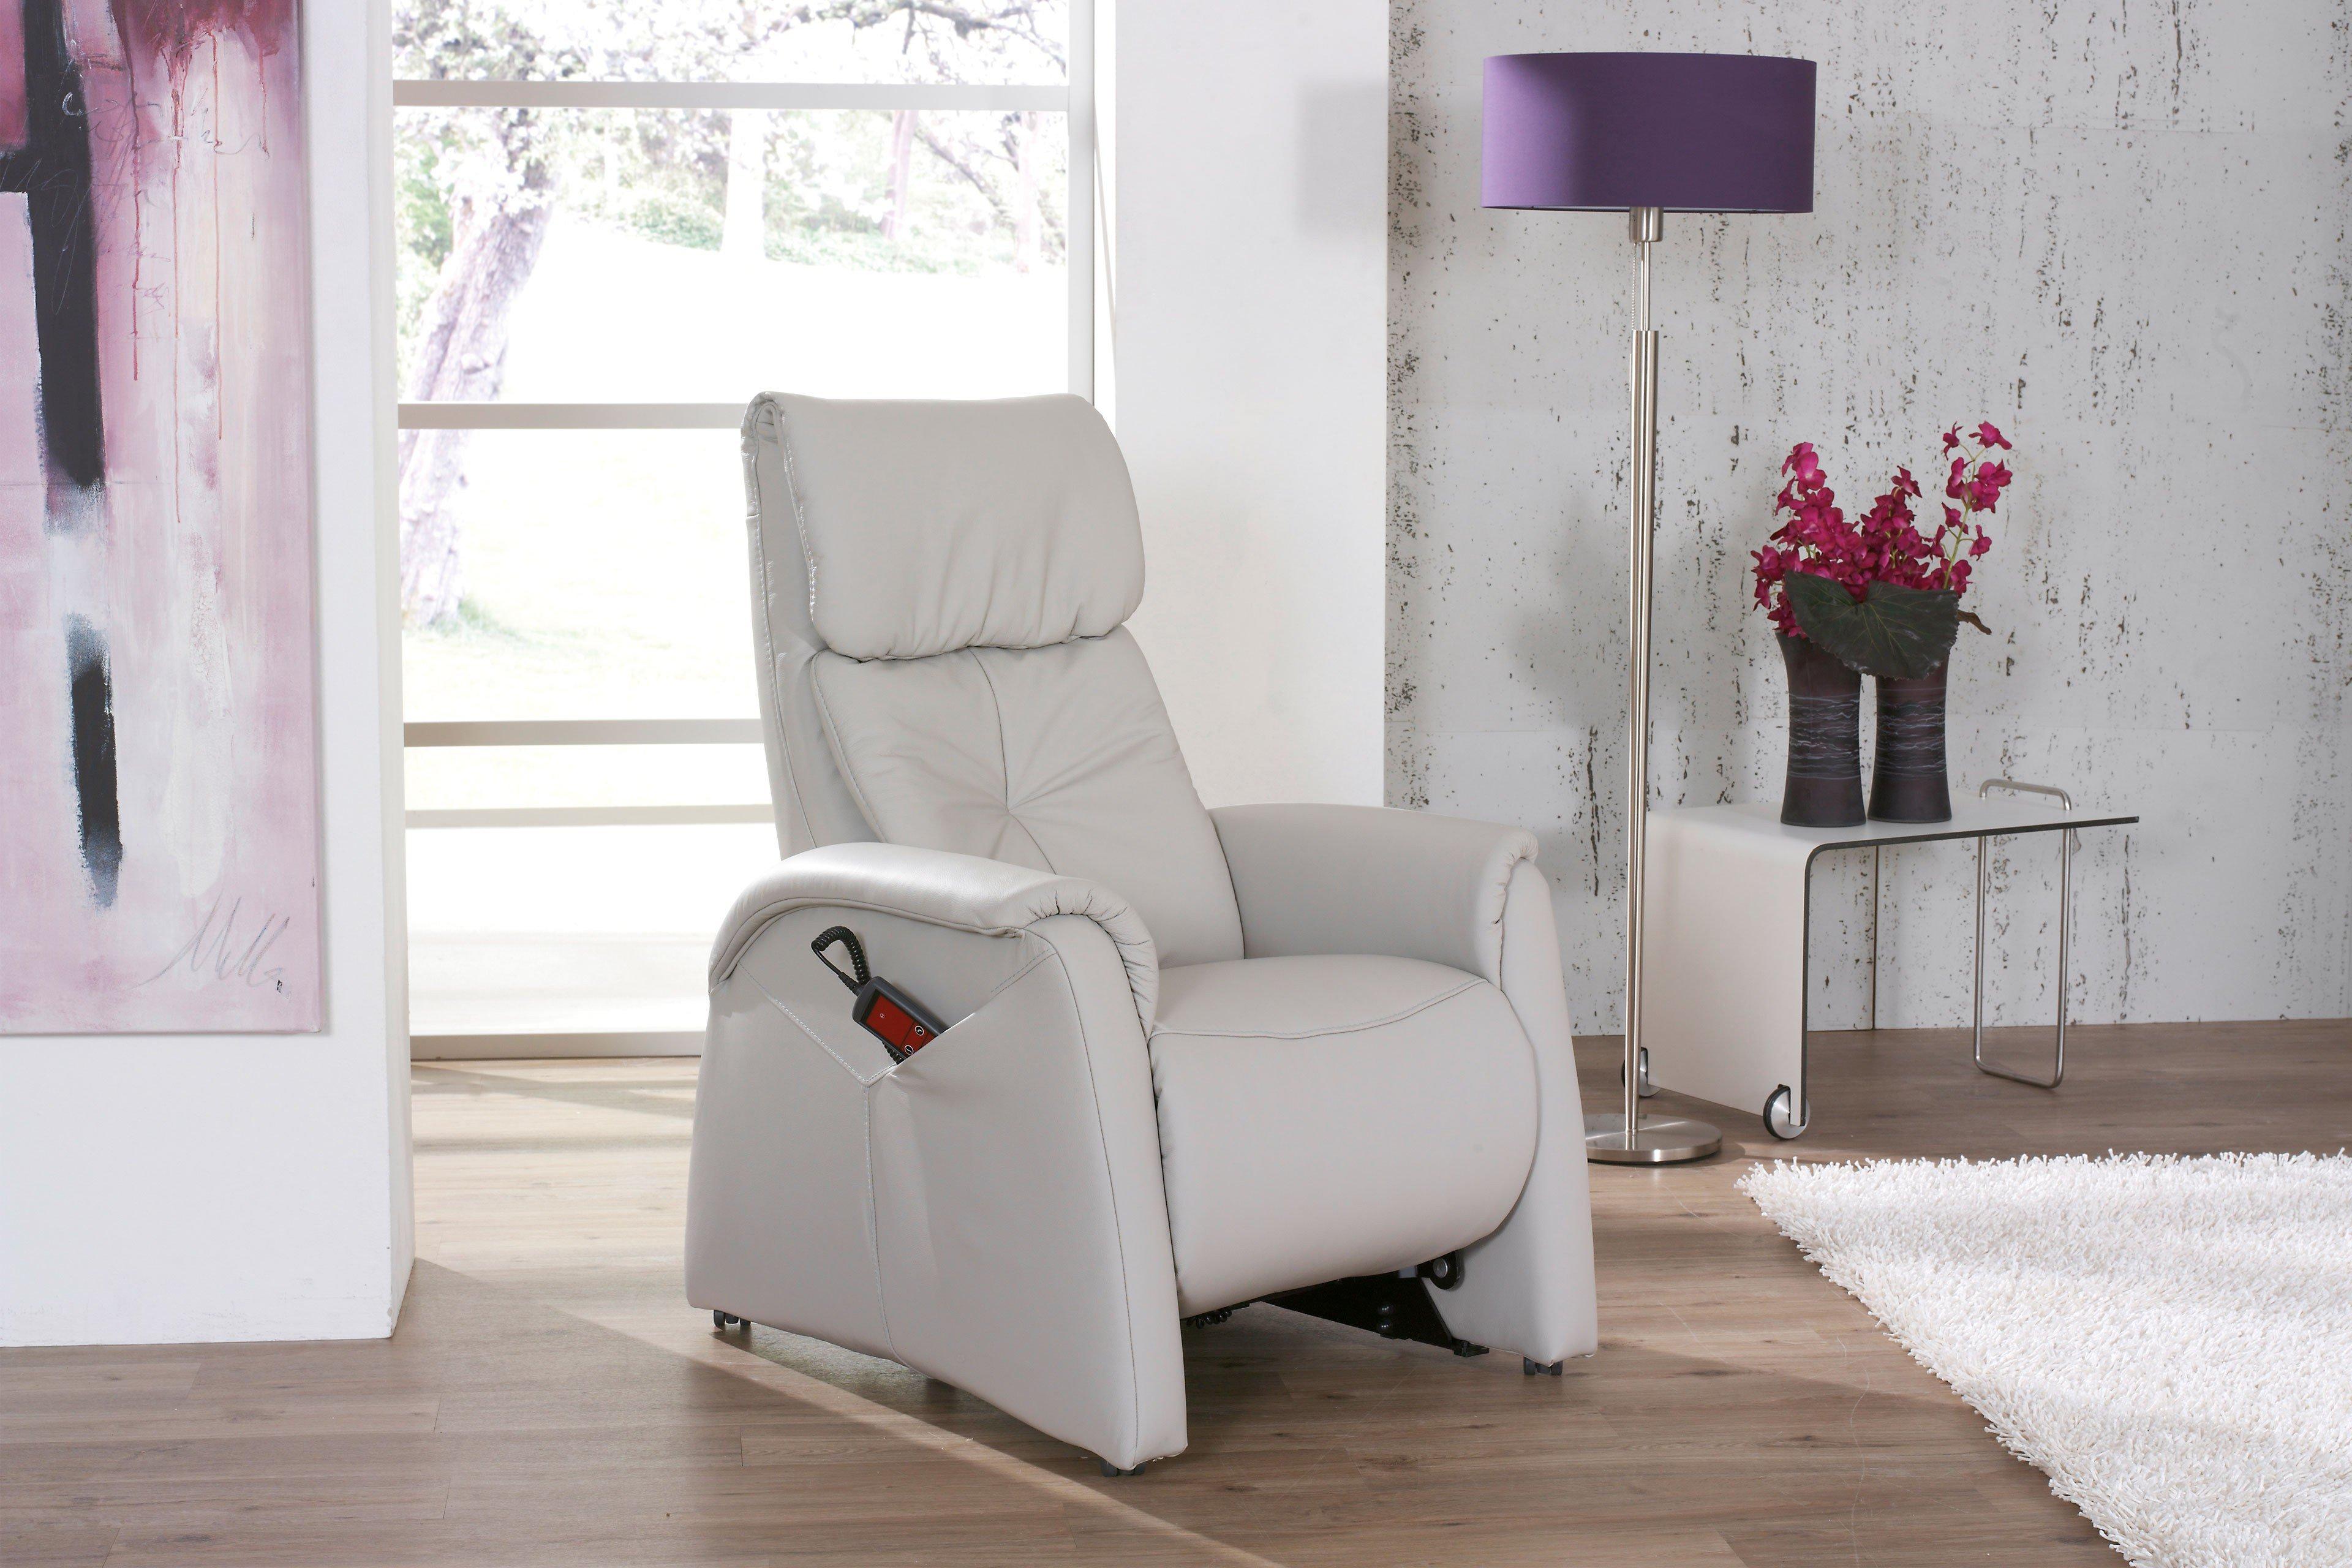 himolla 7239 relaxsessel hellgrau m bel letz ihr online shop. Black Bedroom Furniture Sets. Home Design Ideas